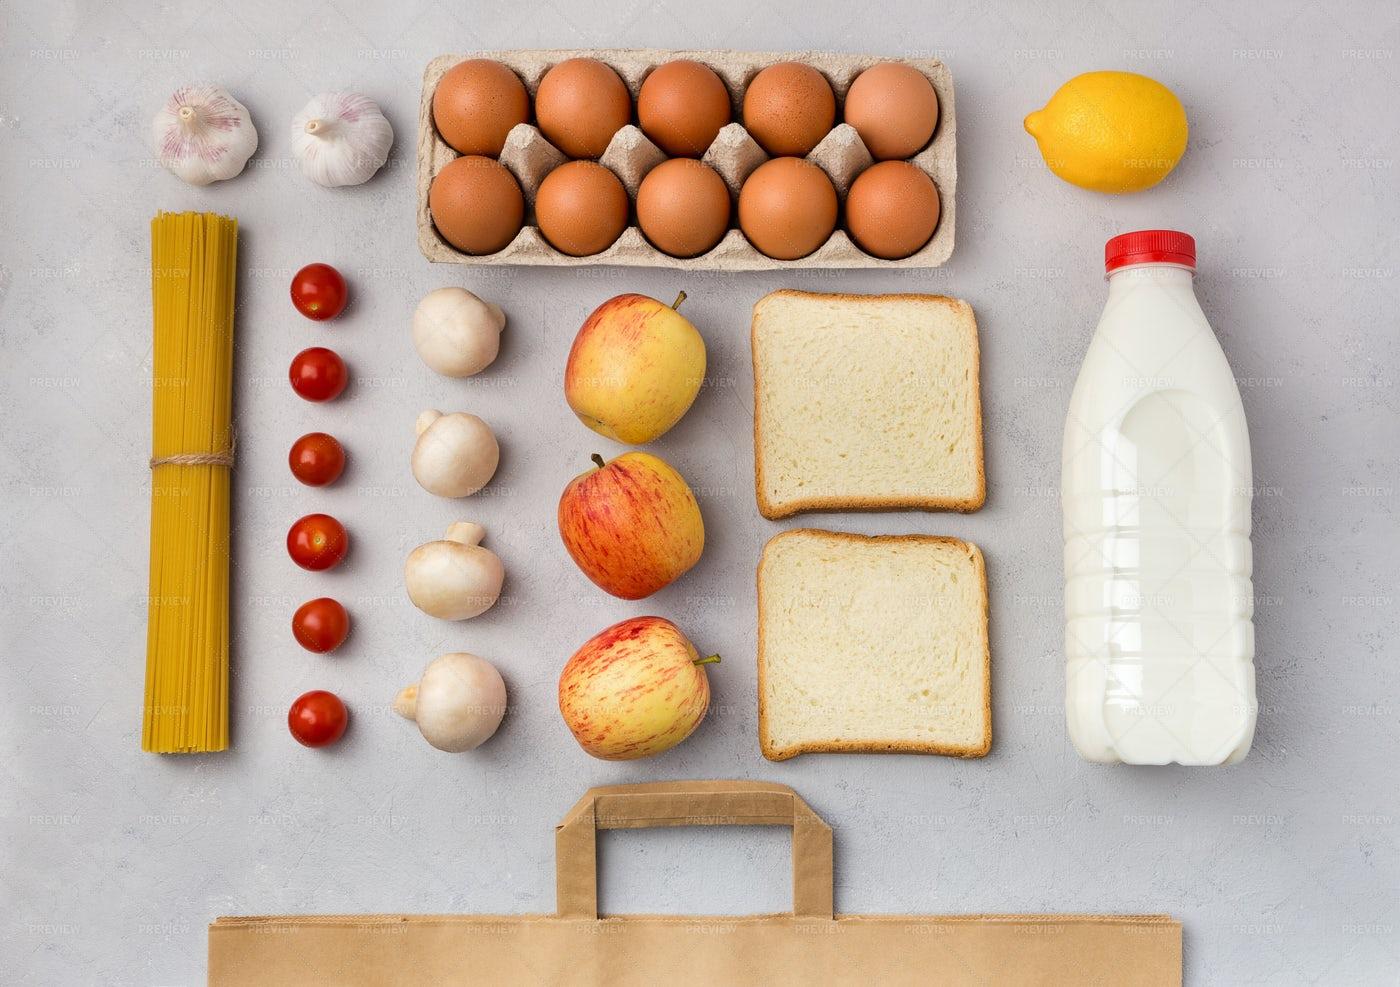 Grocery Foodstuff: Stock Photos